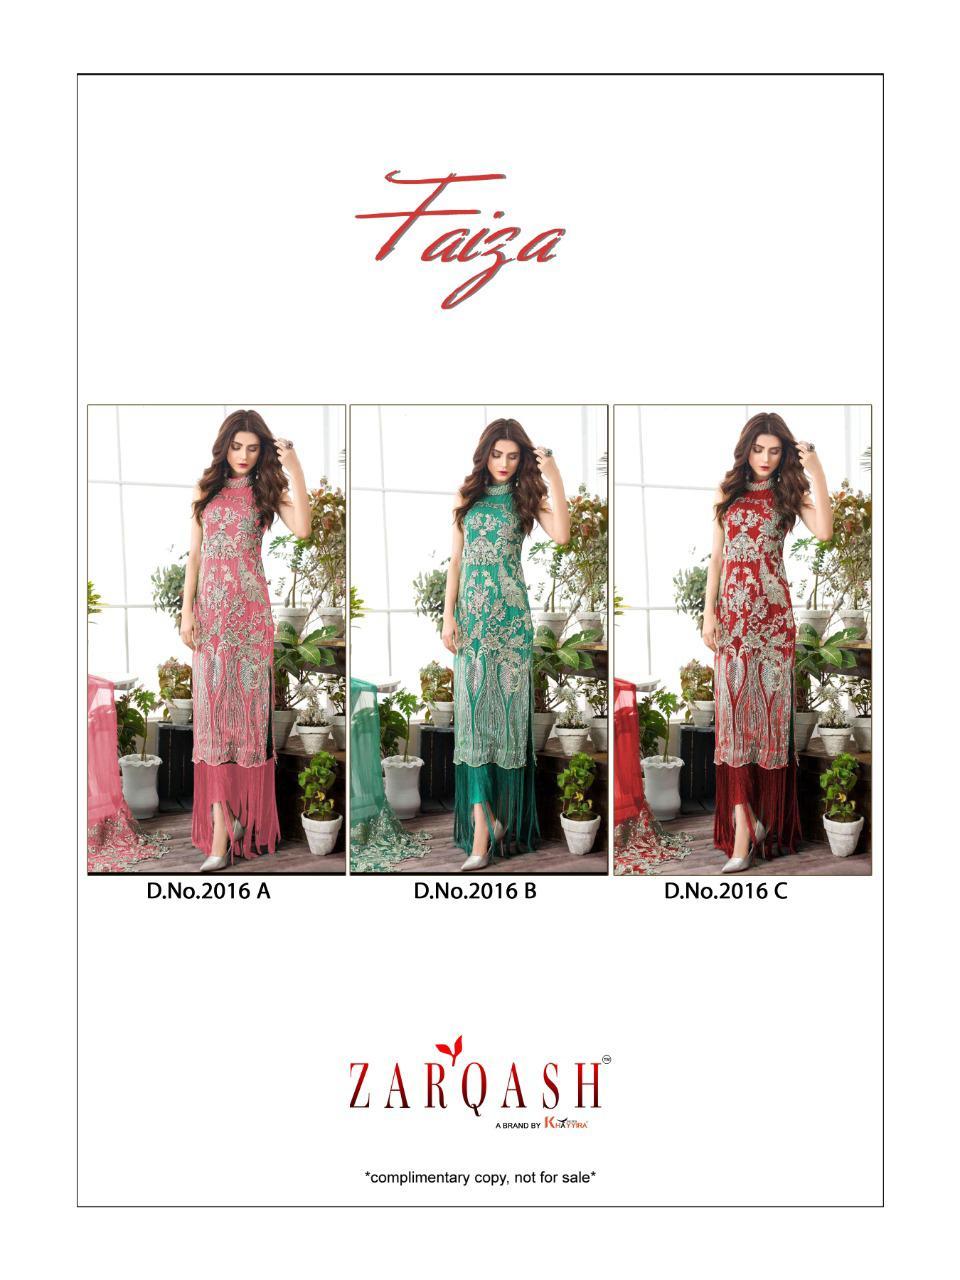 Zarqash Faiza by Khayyira Salwar Suit Wholesale Catalog 3 Pcs 5 - Zarqash Faiza by Khayyira Salwar Suit Wholesale Catalog 3 Pcs